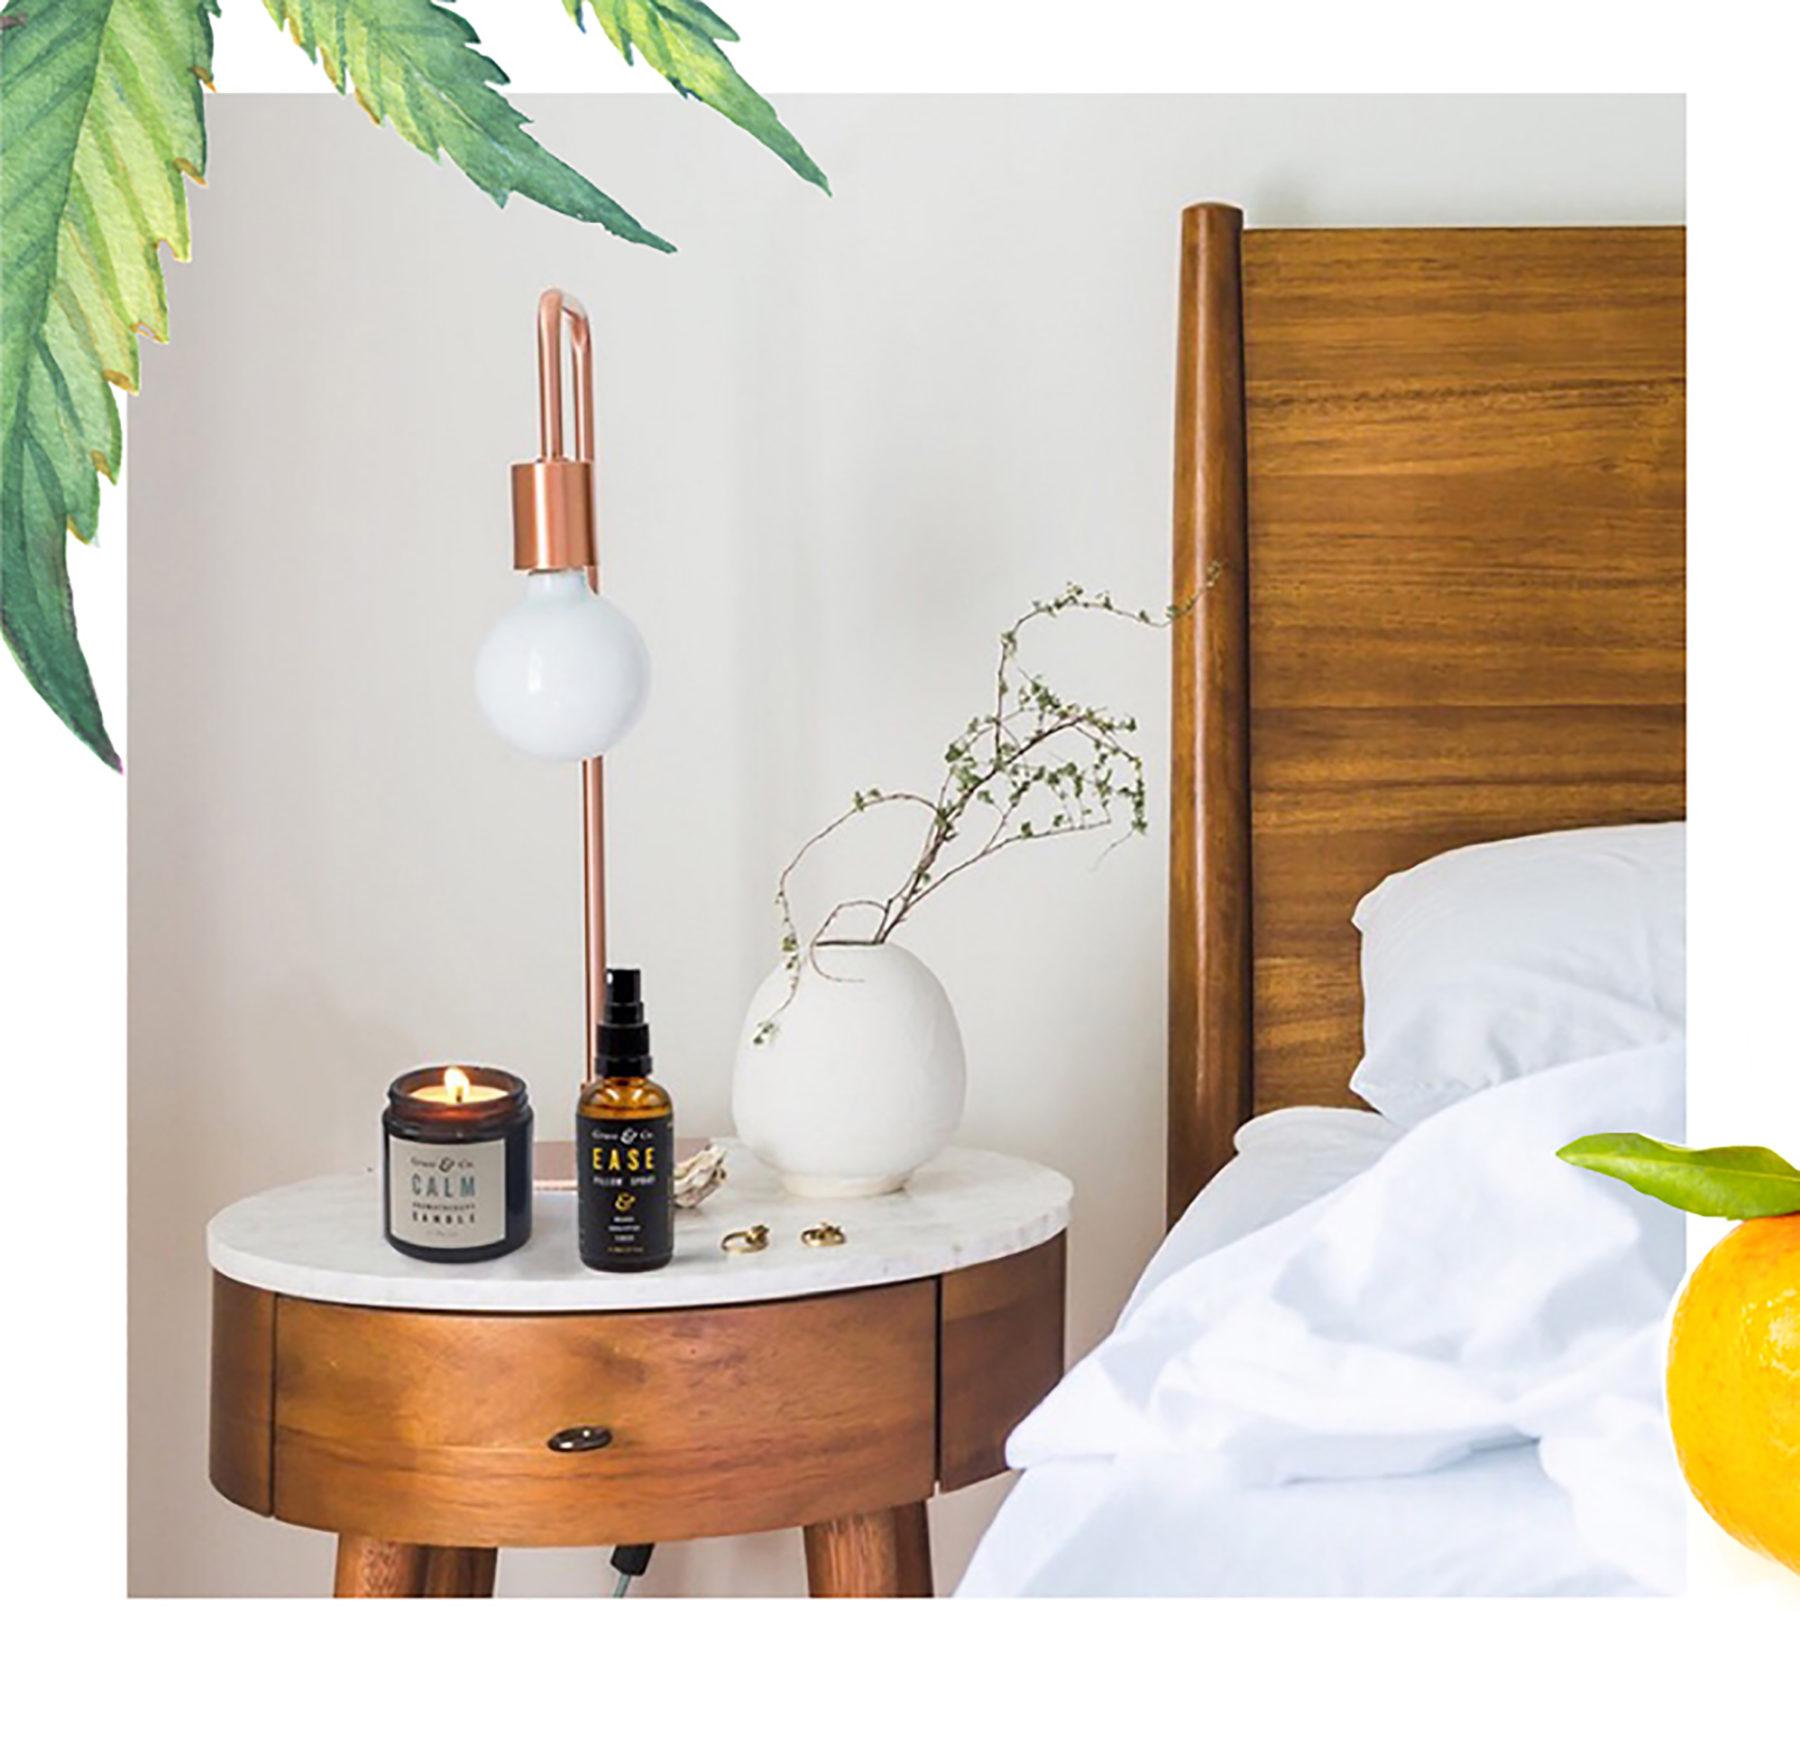 Luxury Hotel CBD Products